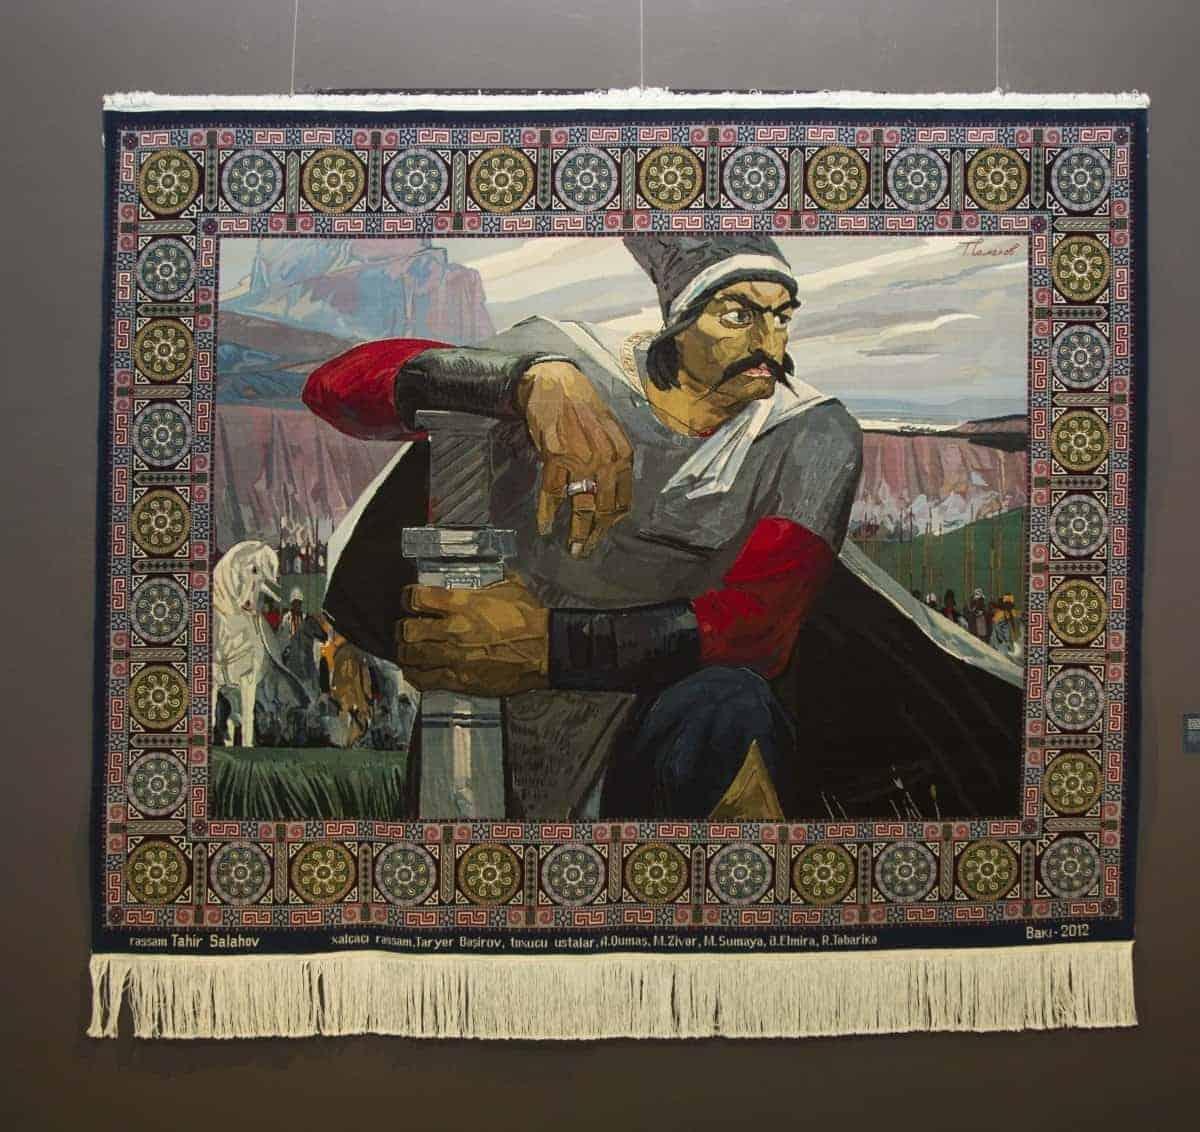 Carpet Koroghlu. Azerbaijan. 2012. Wool, cotton. Pile, handmade. 255x204 cm. It was woven on the base of Tahir Salakhov's painting. Sketch author: T.Bashirov